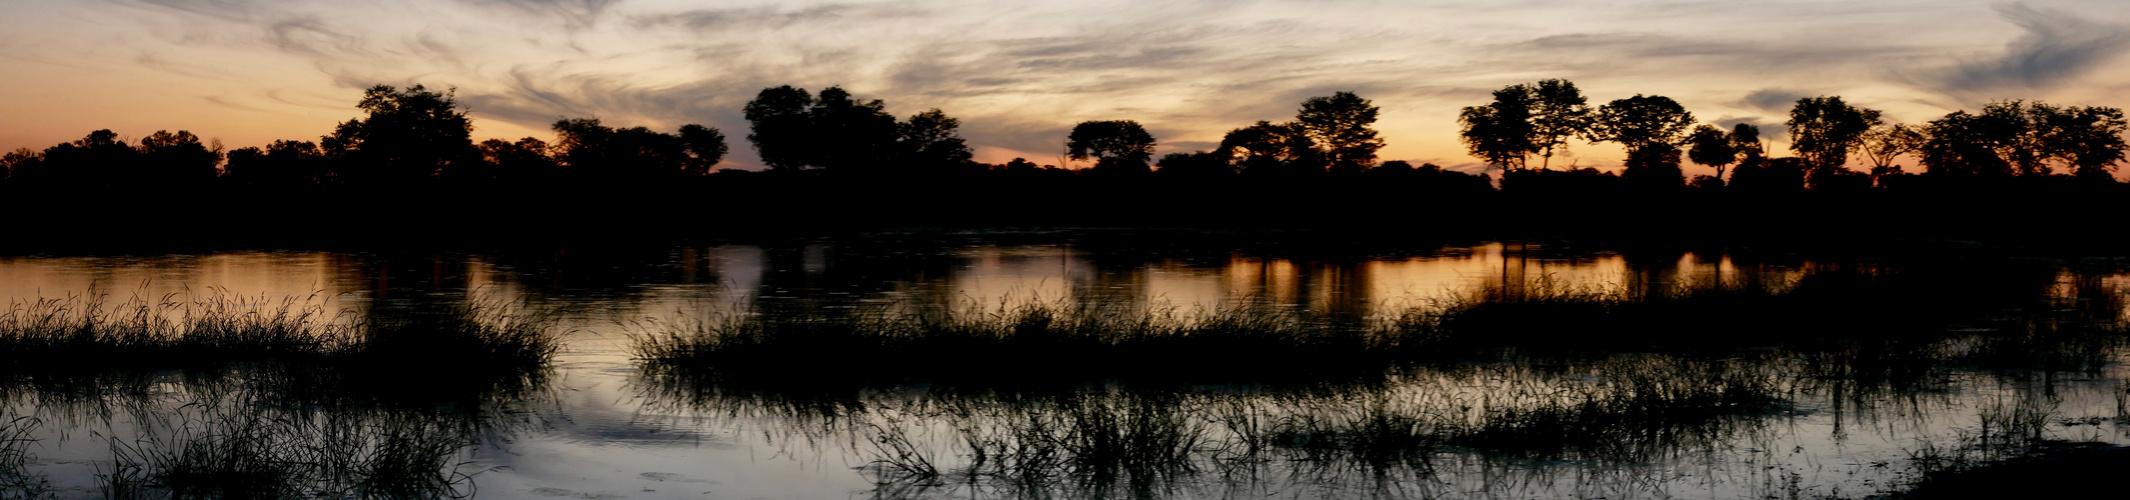 Sonnenuntergang im Okavangodelta Botswana